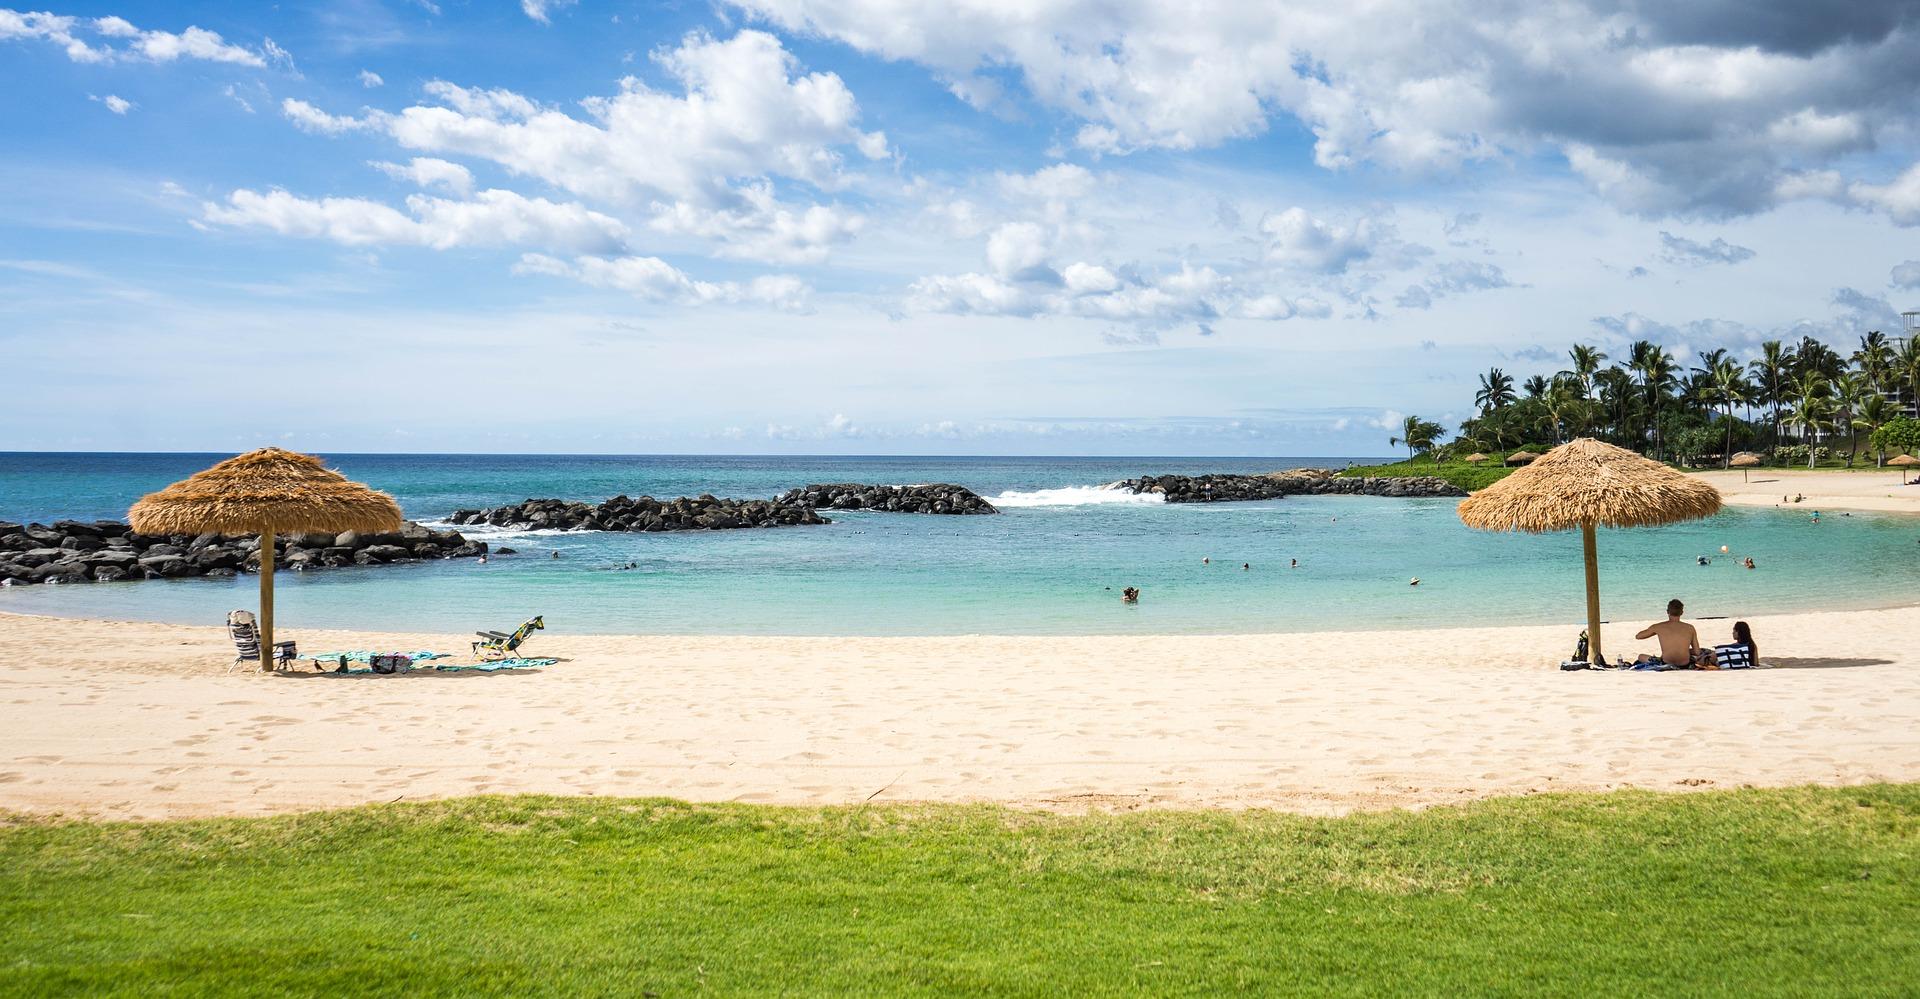 Гаваї пляж